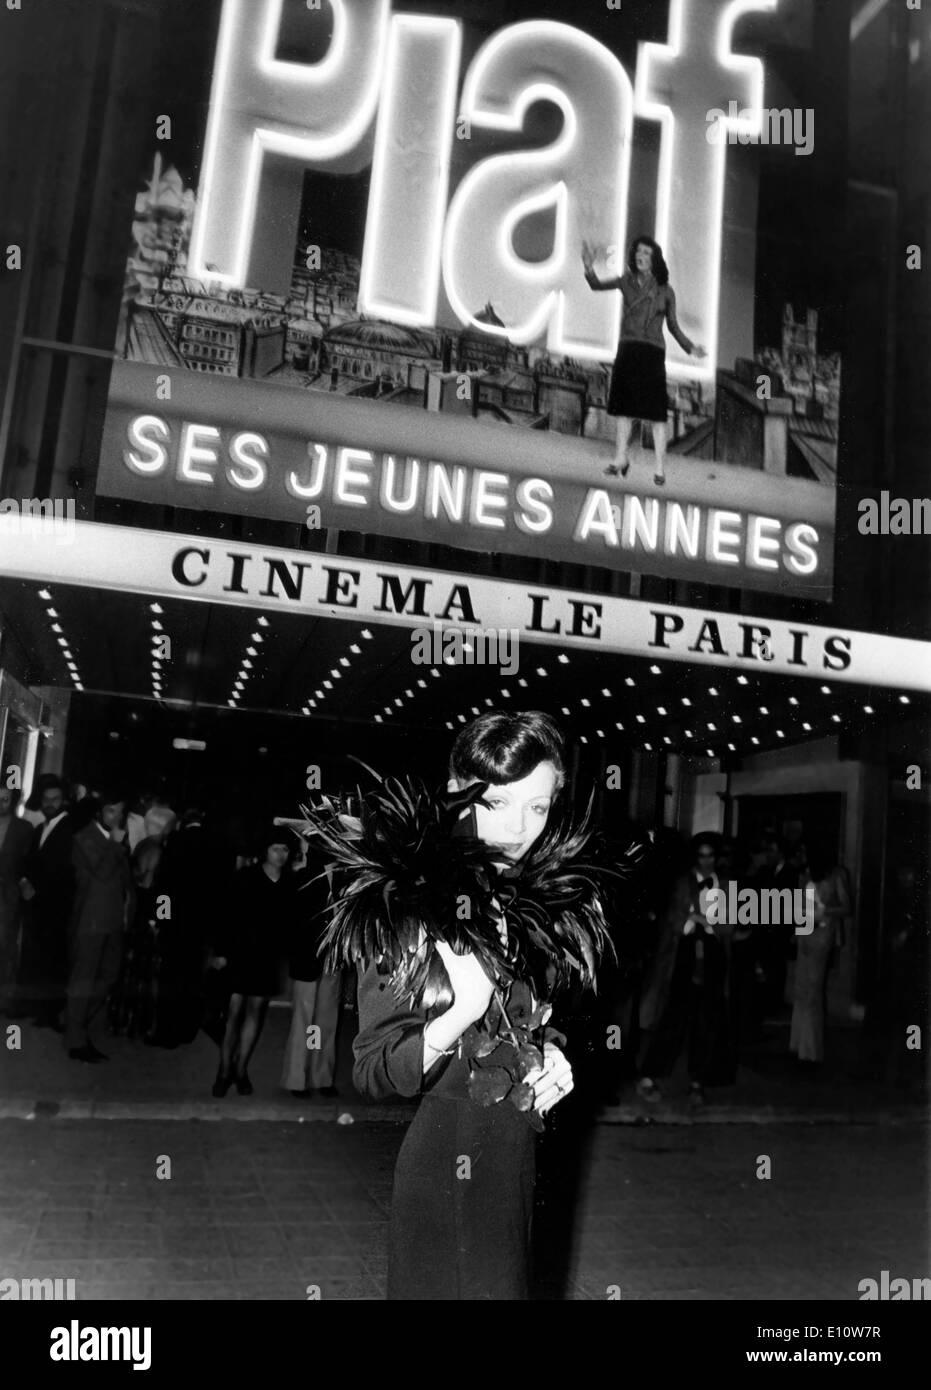 Actress, BRIGITTE ARIEL as Edith Piaf at Cinema in Champs Elysees